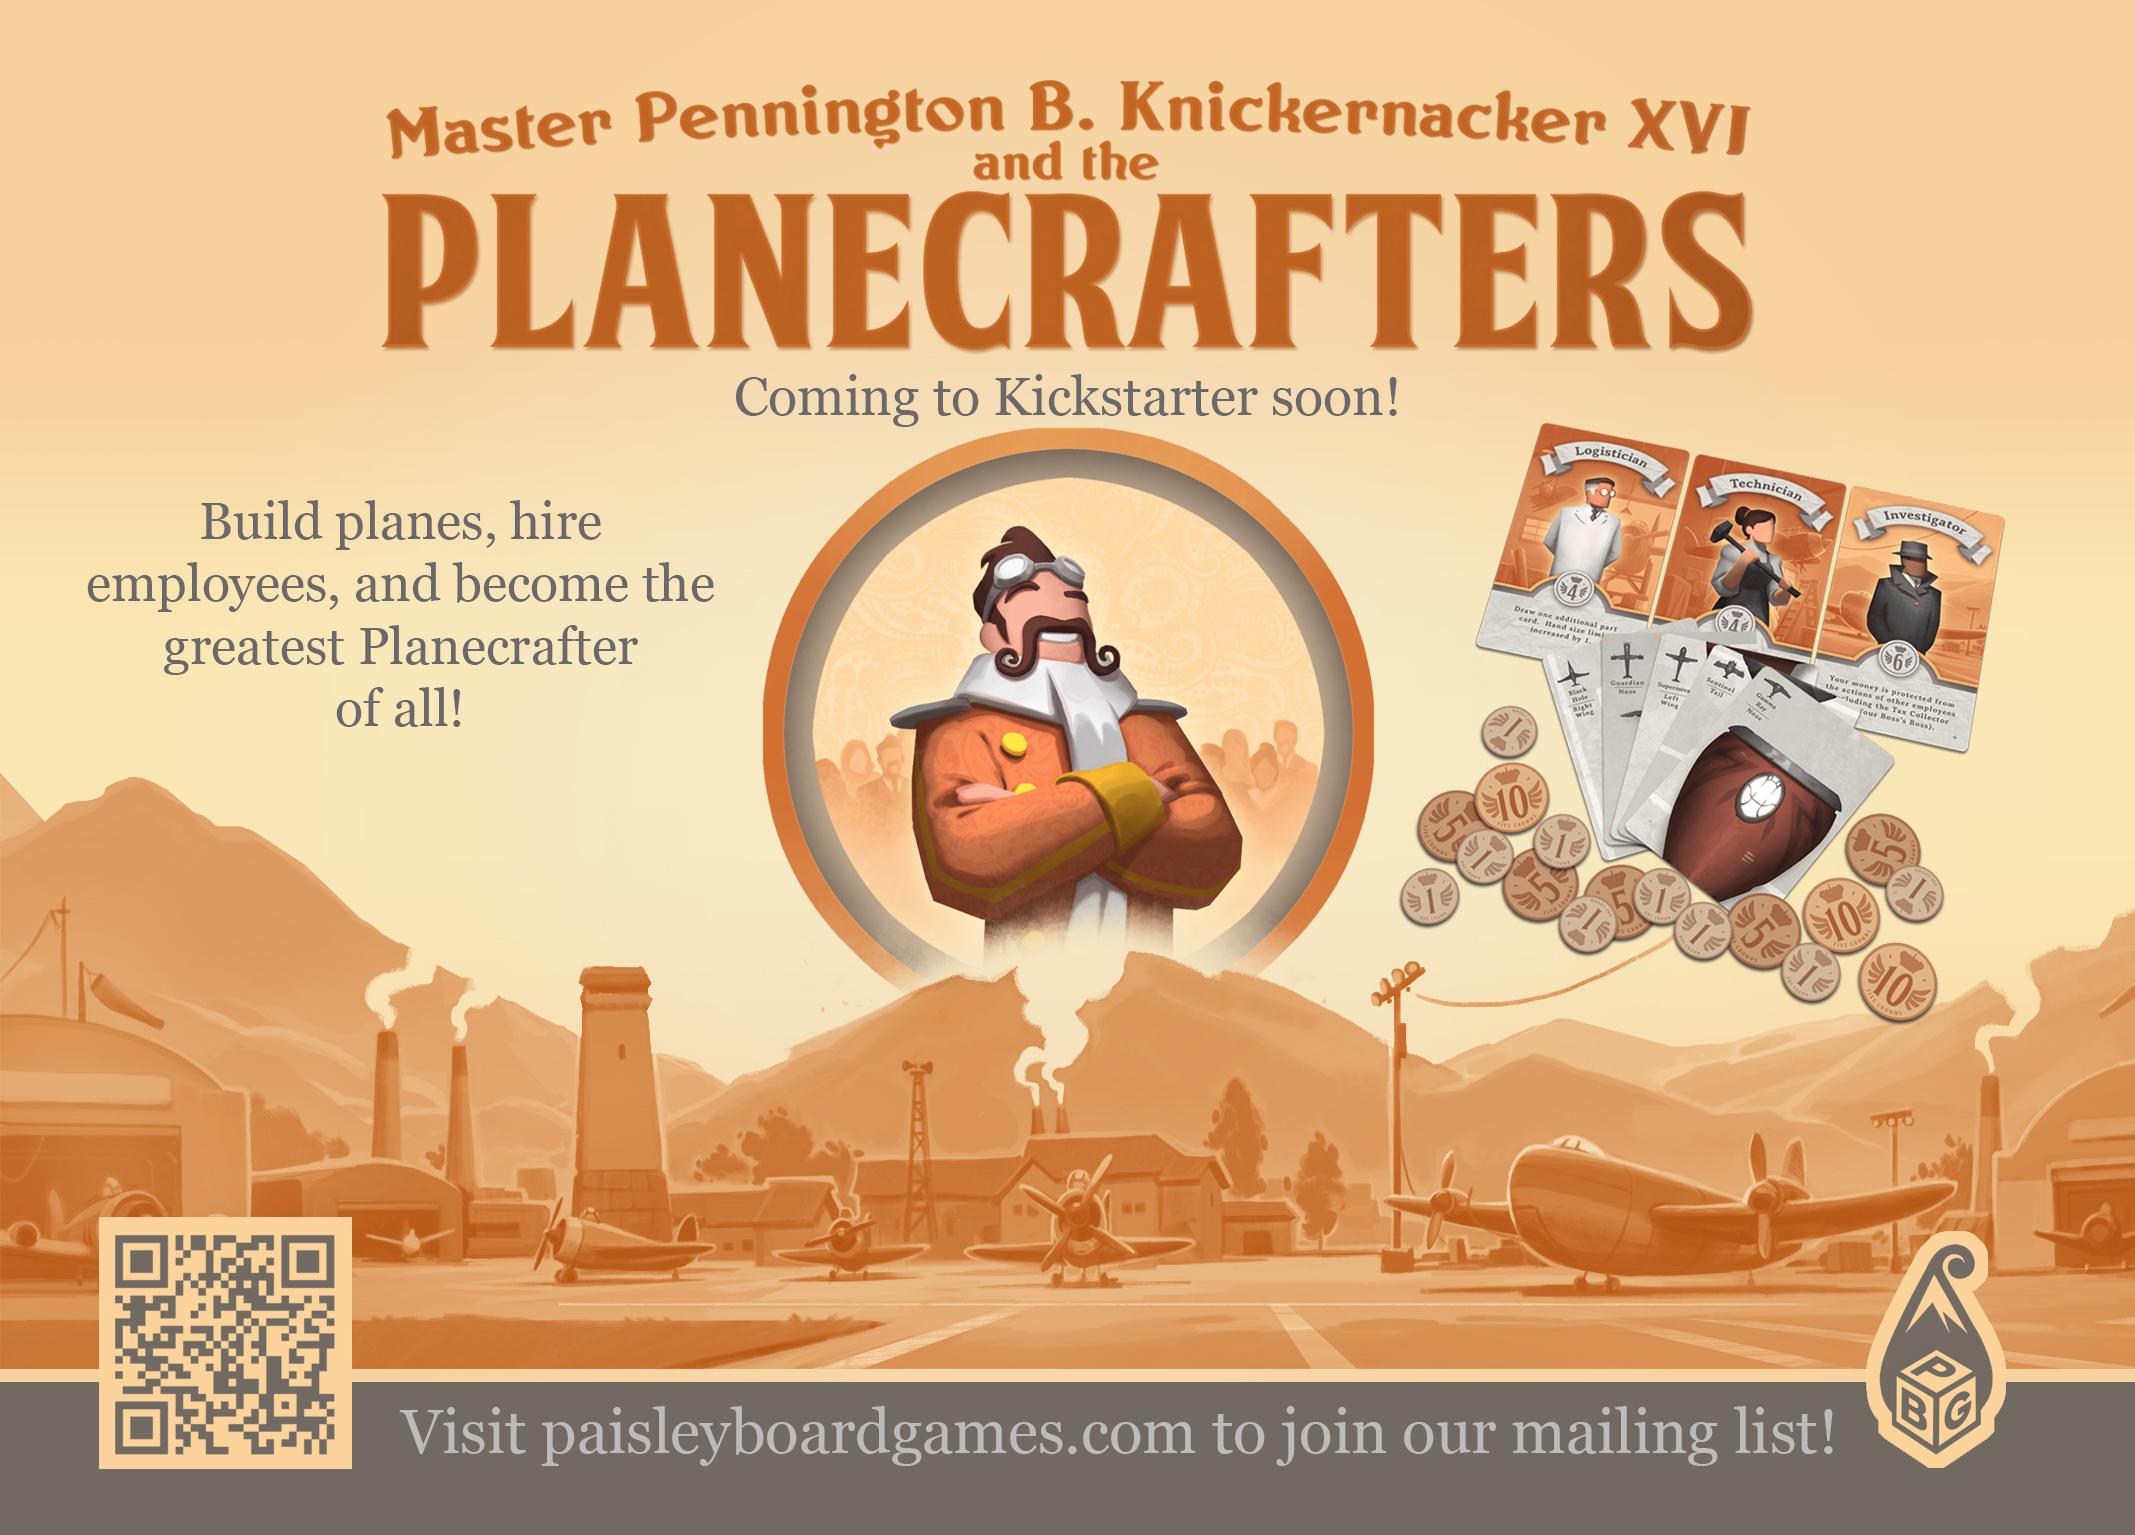 Planecrafters_Promo_ab.jpg